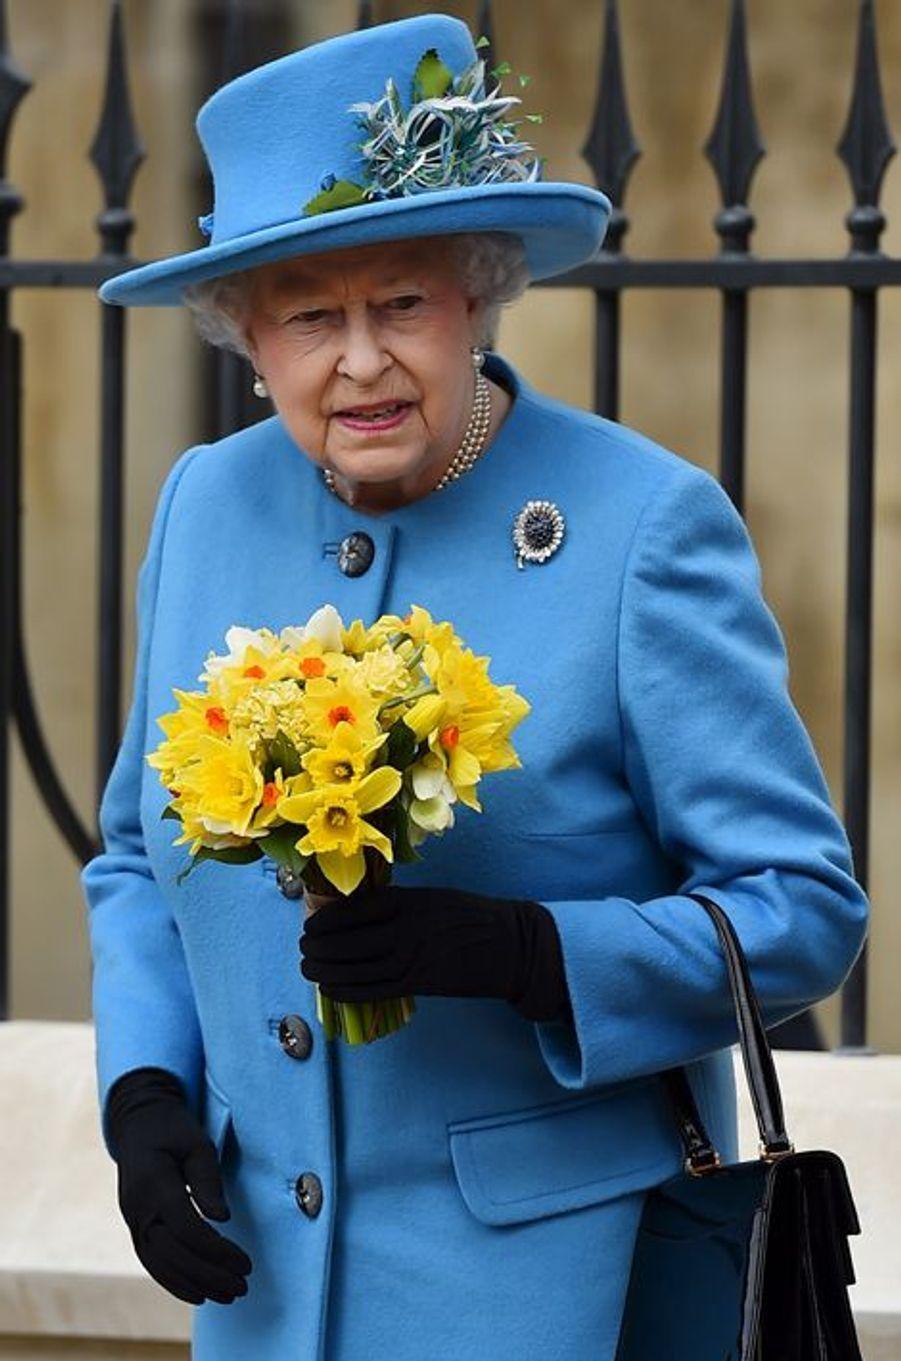 La reine Elizabeth II à Windsor, le 5 avril 2015